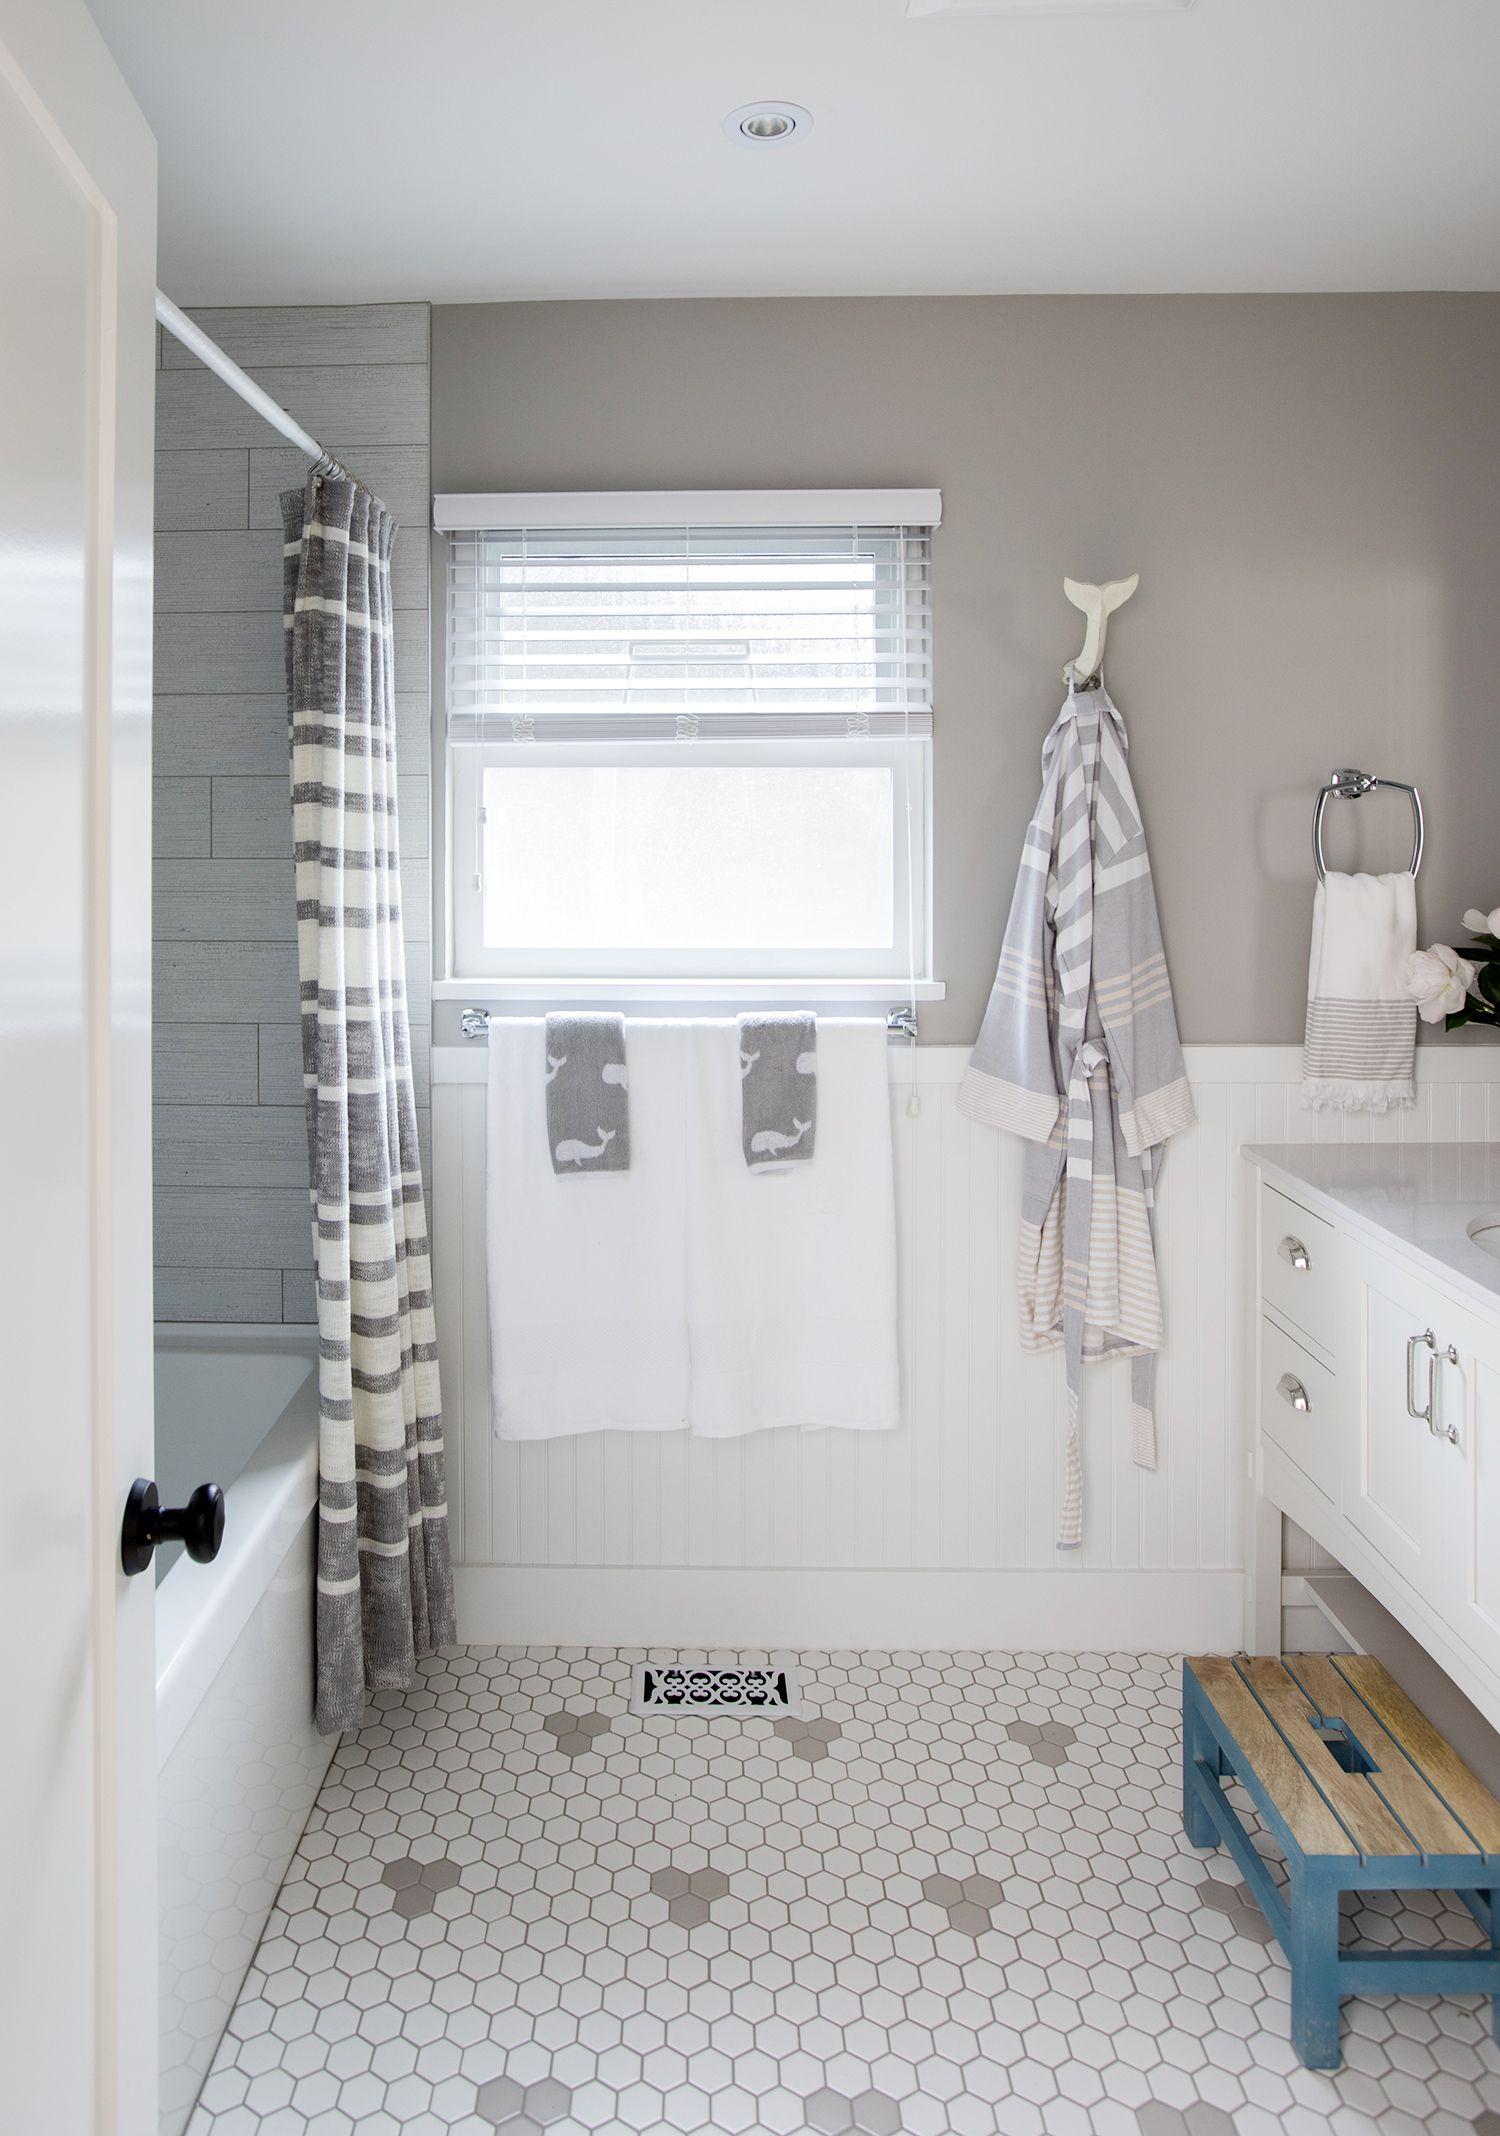 12 kids' bathroom design ideas that make a big splash